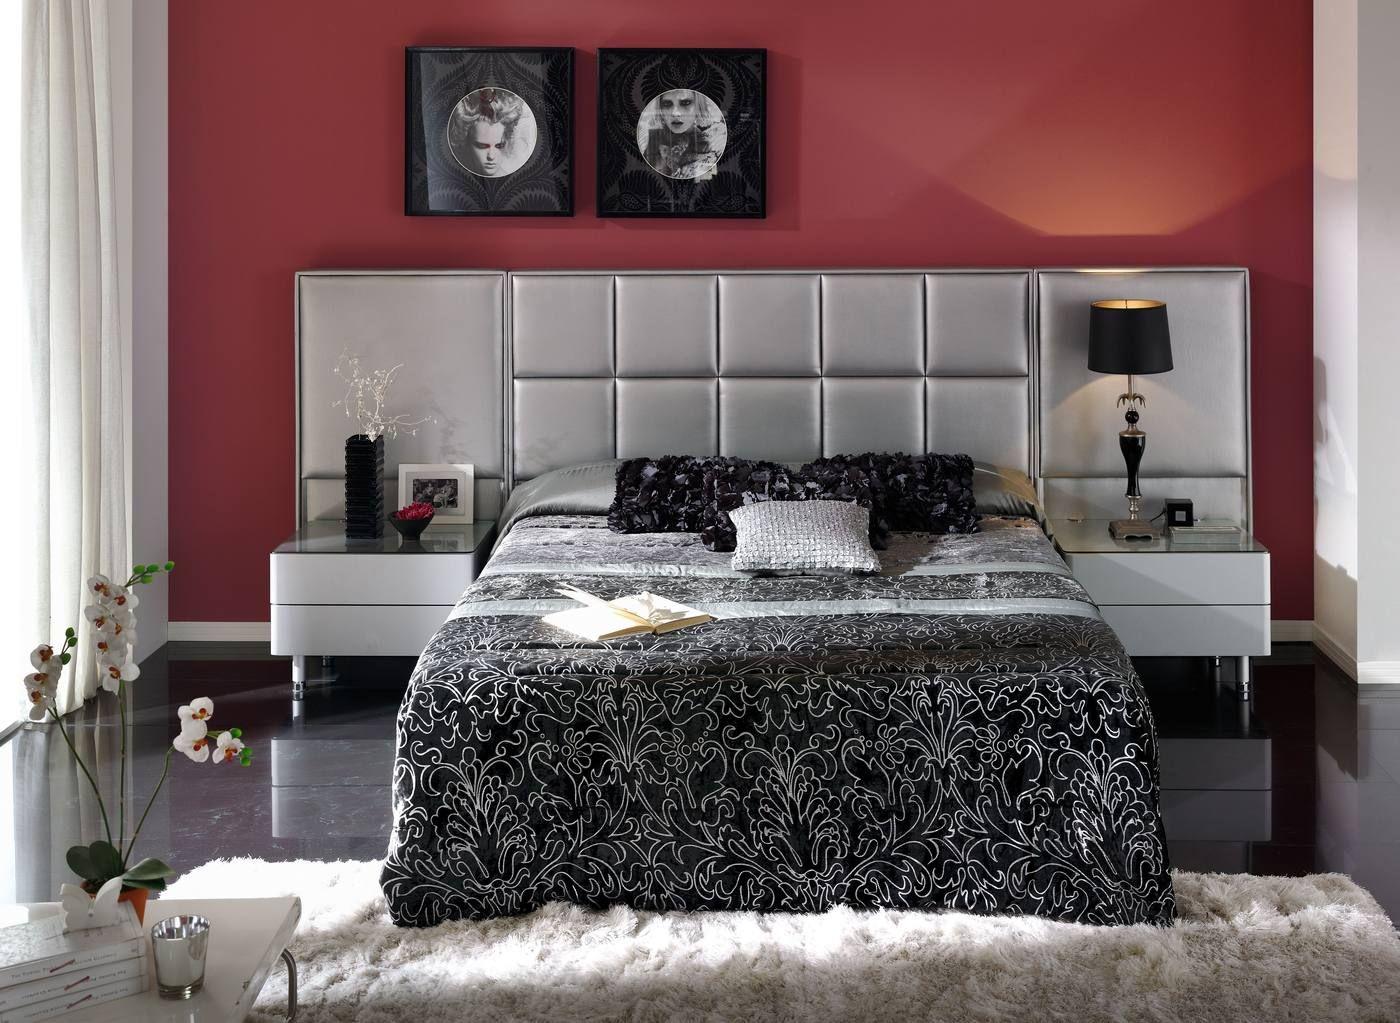 Cabeceras De Cama Tapizadas Google Search Muebles Pinterest  # Tauron Muebles Mercadolibre